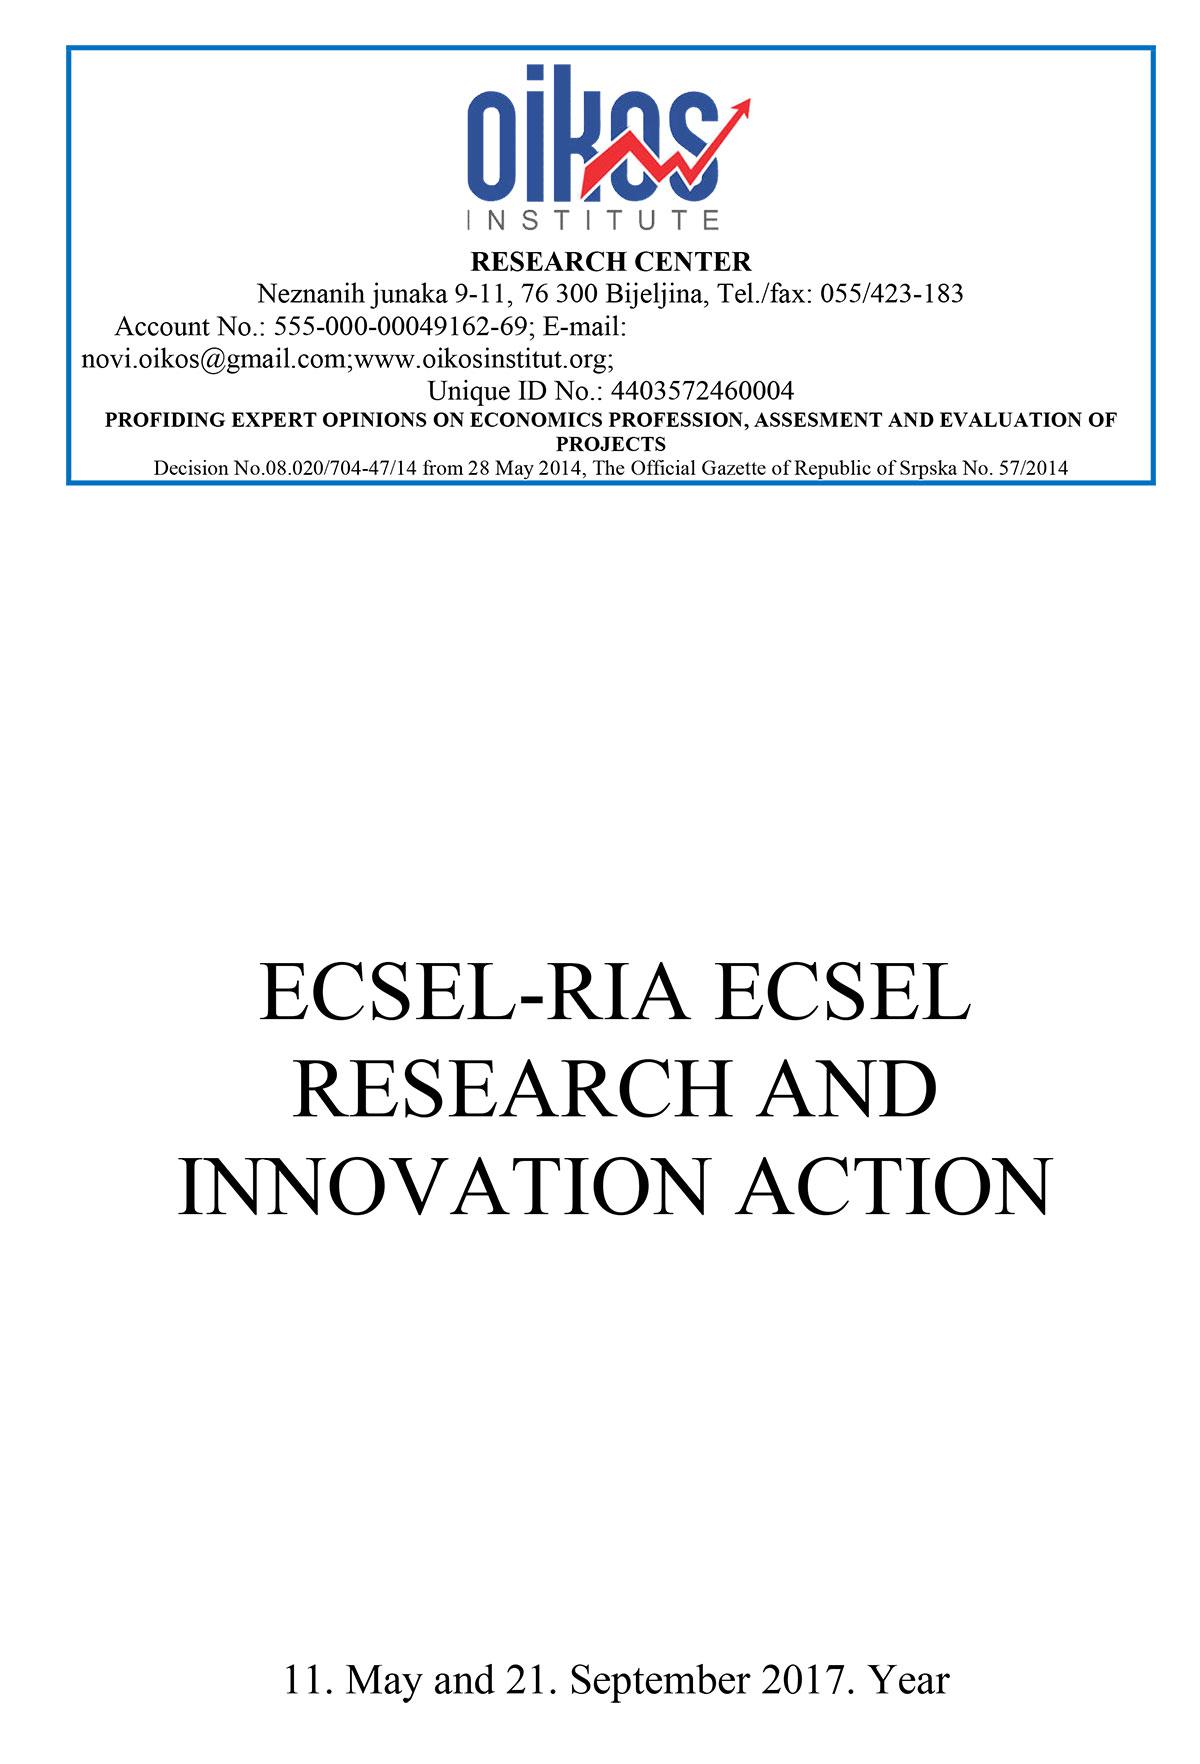 inovation-action-01